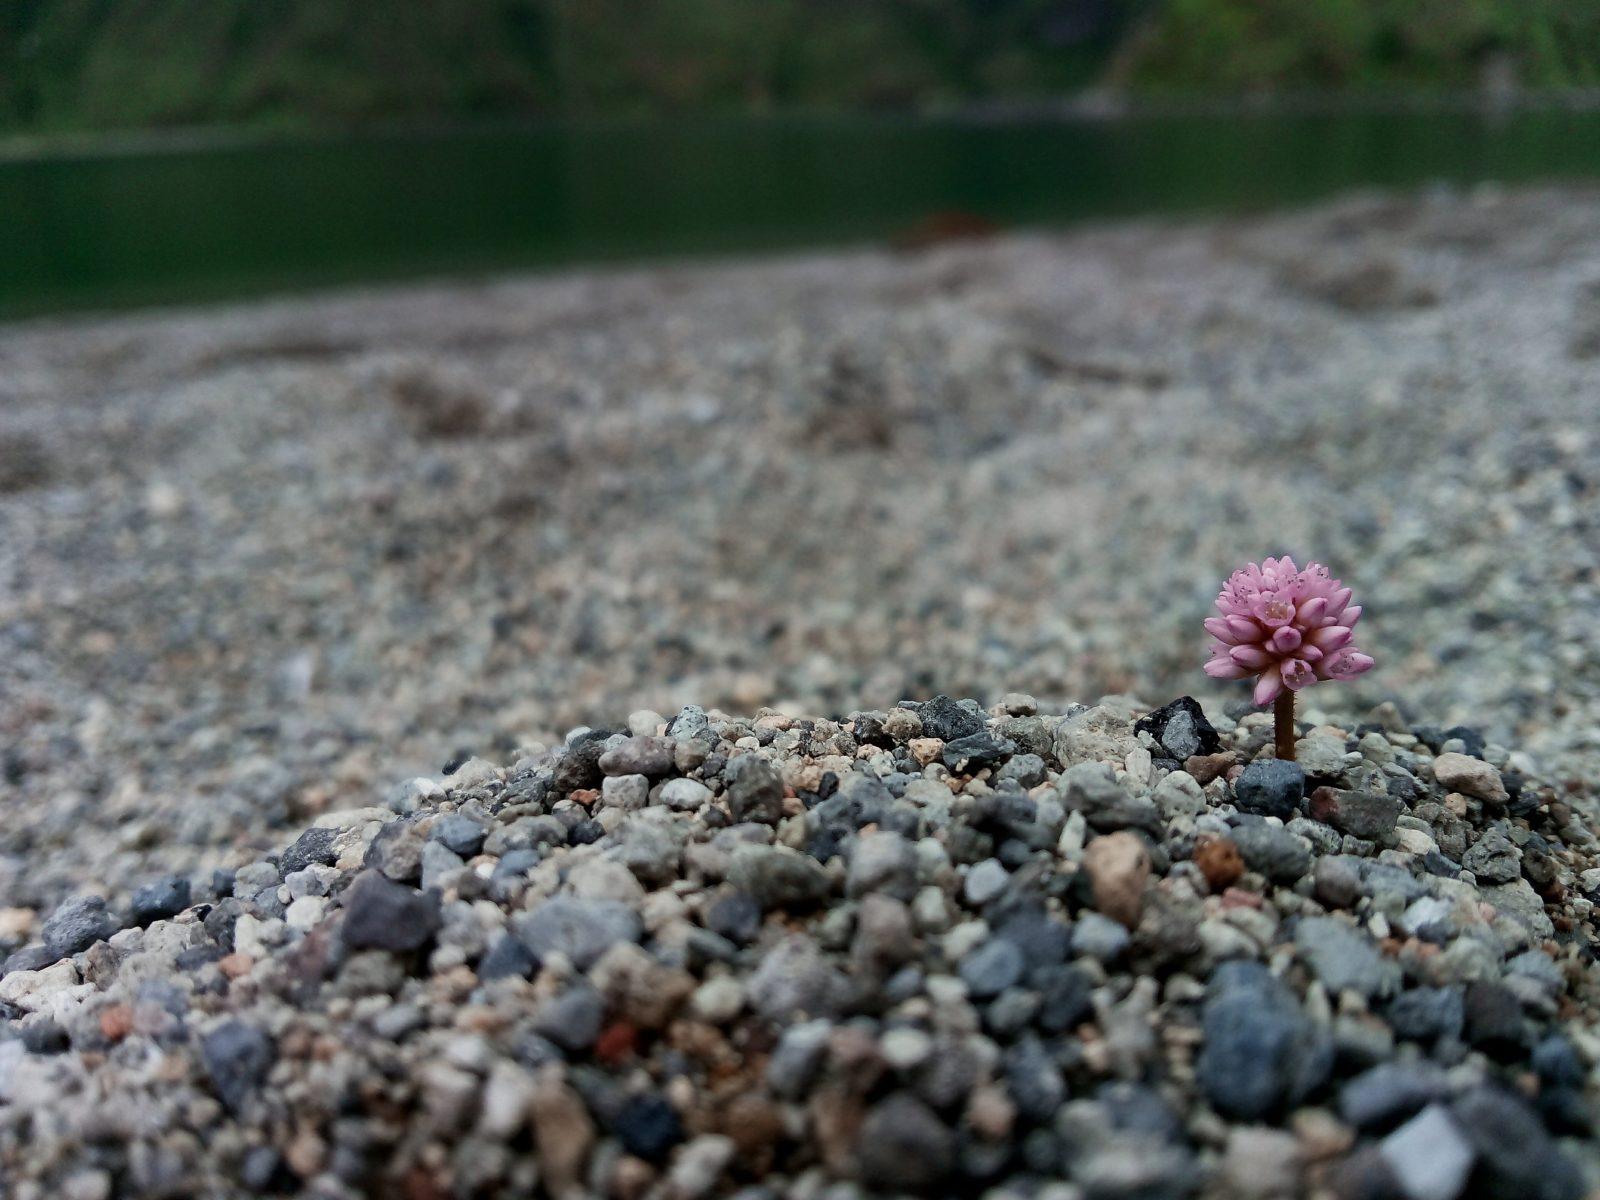 Pequena Flor